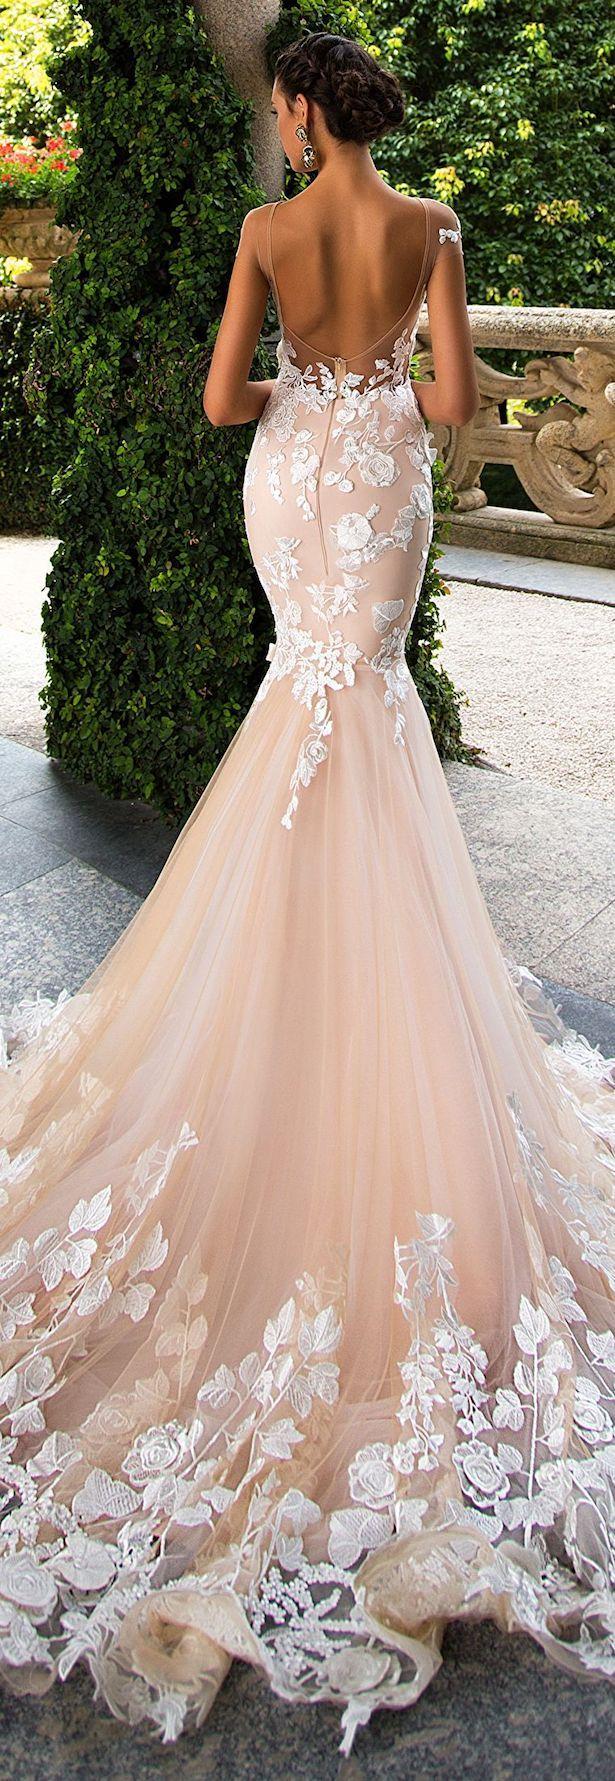 "Wedding Dresses by Milla Nova ""White Desire"" 2017 Bridal"